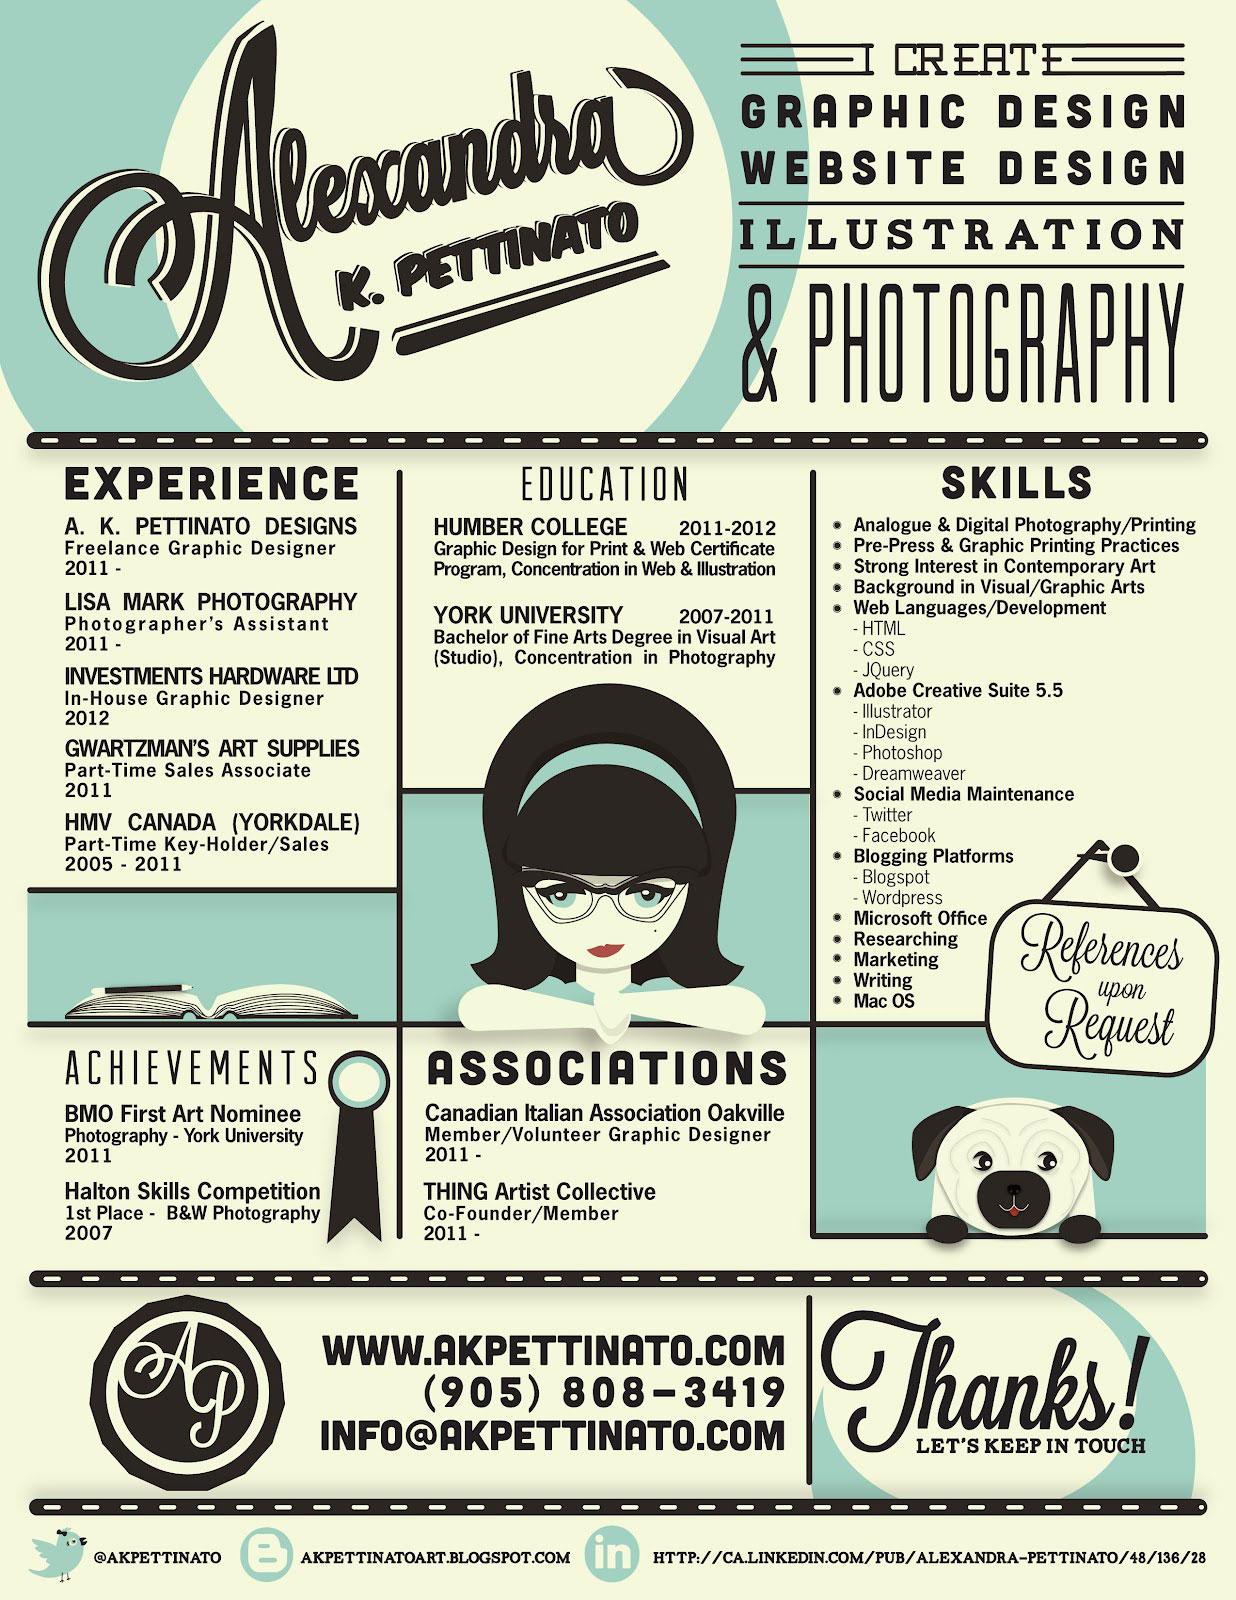 Infographic cv Alexandra